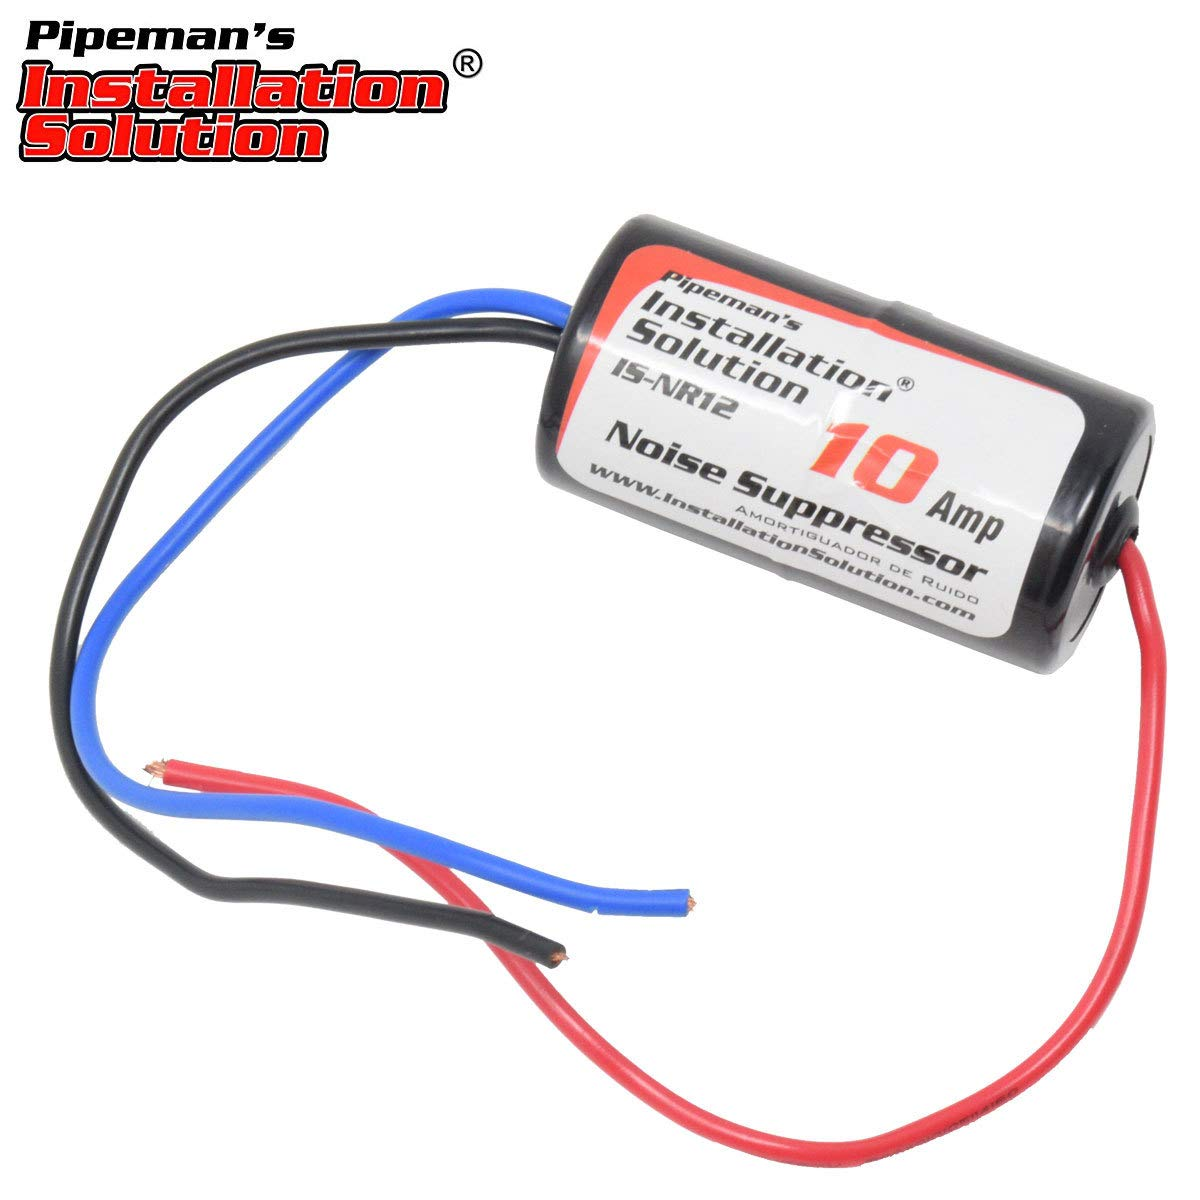 Pipemans Installation Solution 10 Amp Inline Power Noise Suppressor Filter Eliminator Isolator Universal